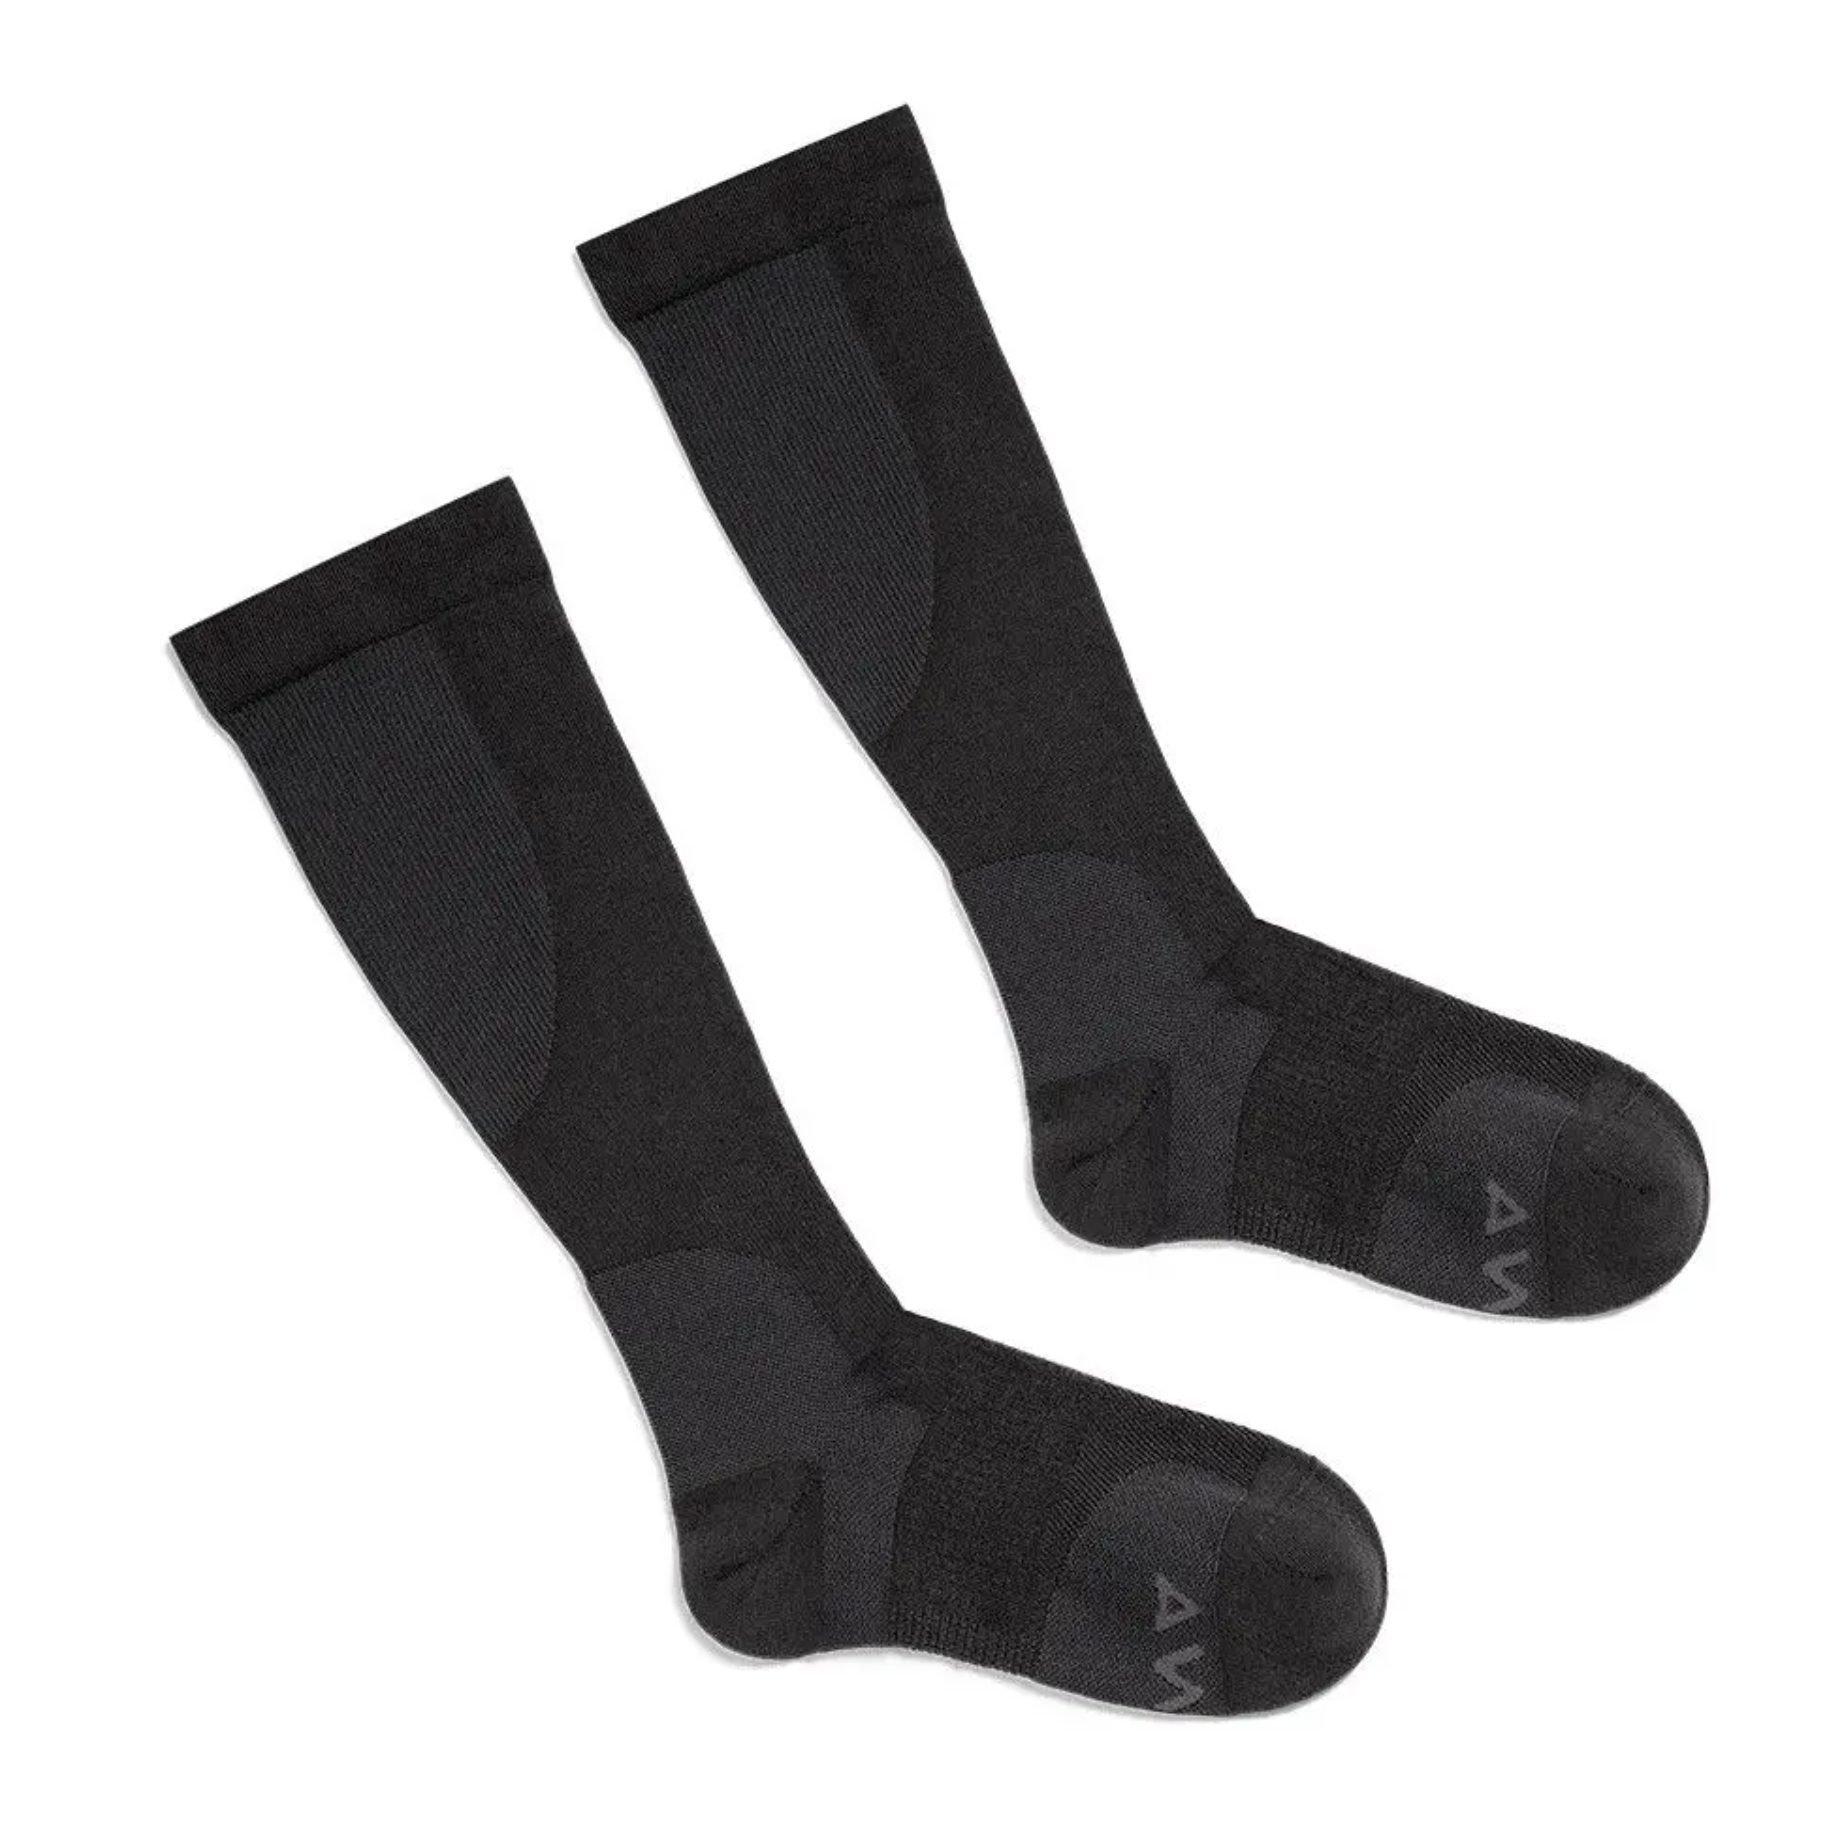 Away Compression Socks